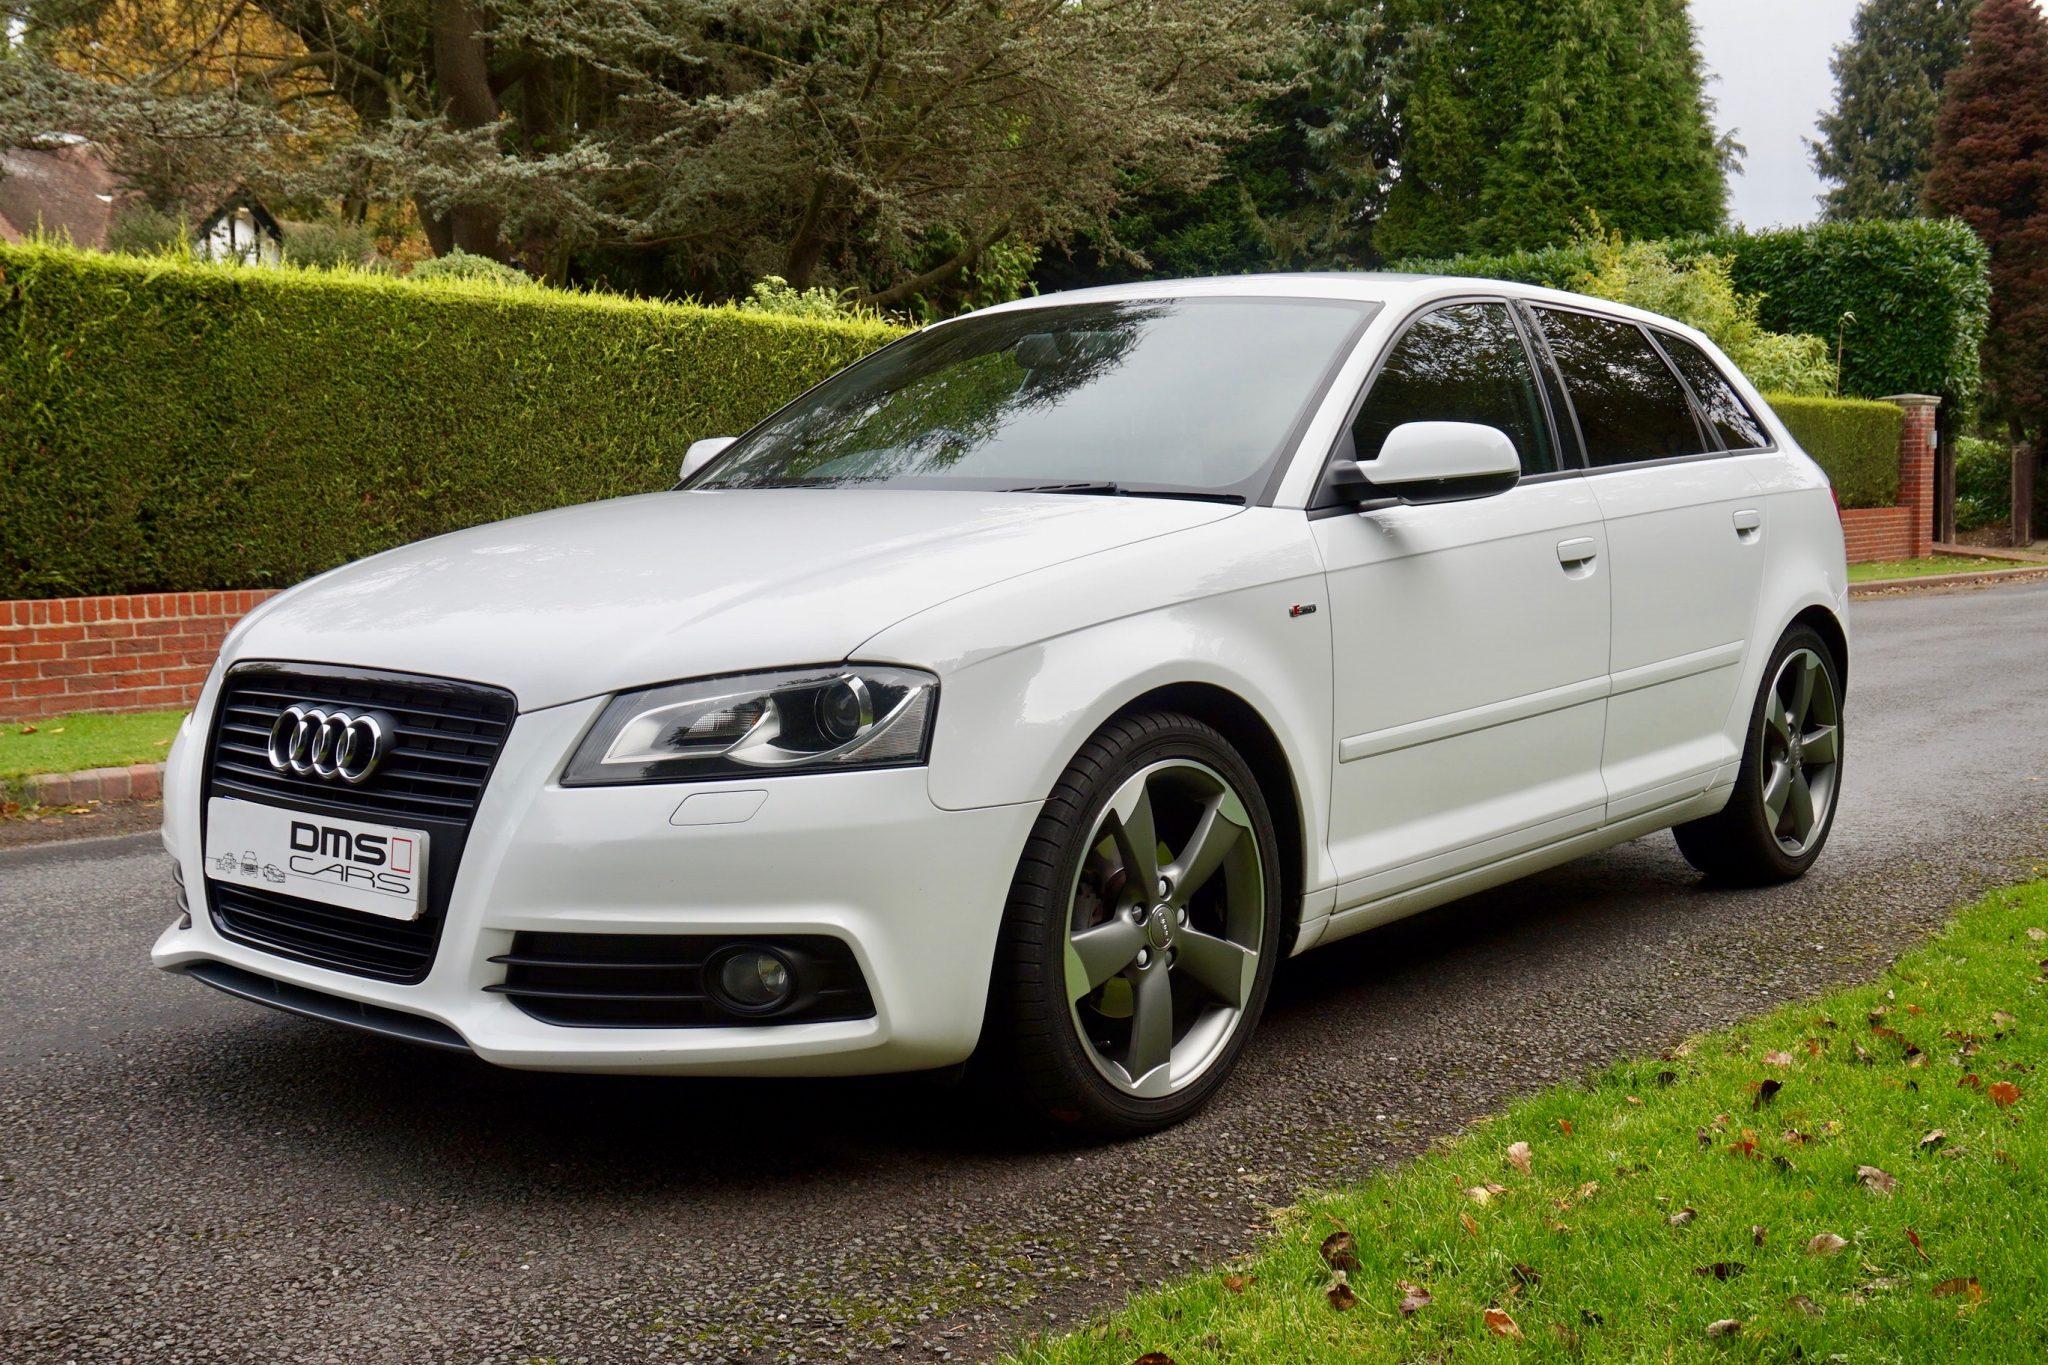 Audi A3 Sportback Black Edition S-Line | DMS Cars